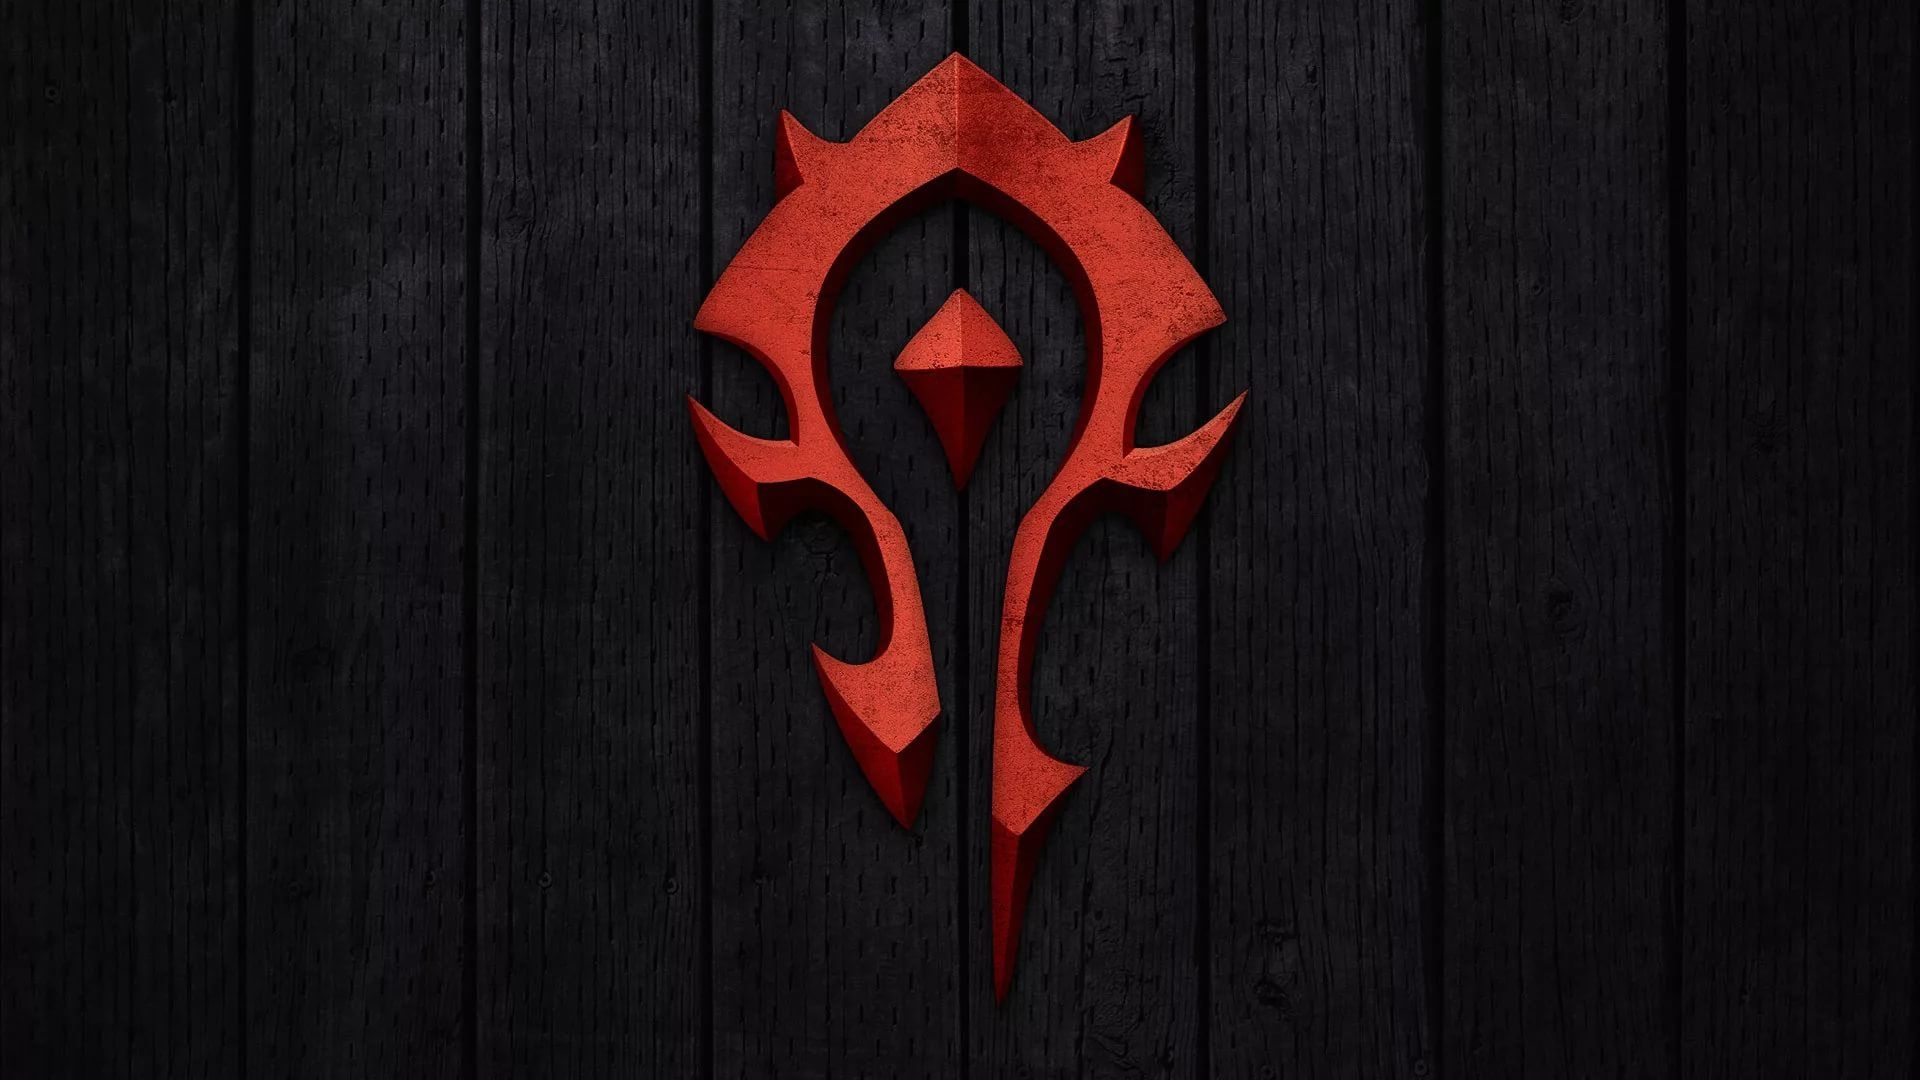 Horde Logo hd wallpaper